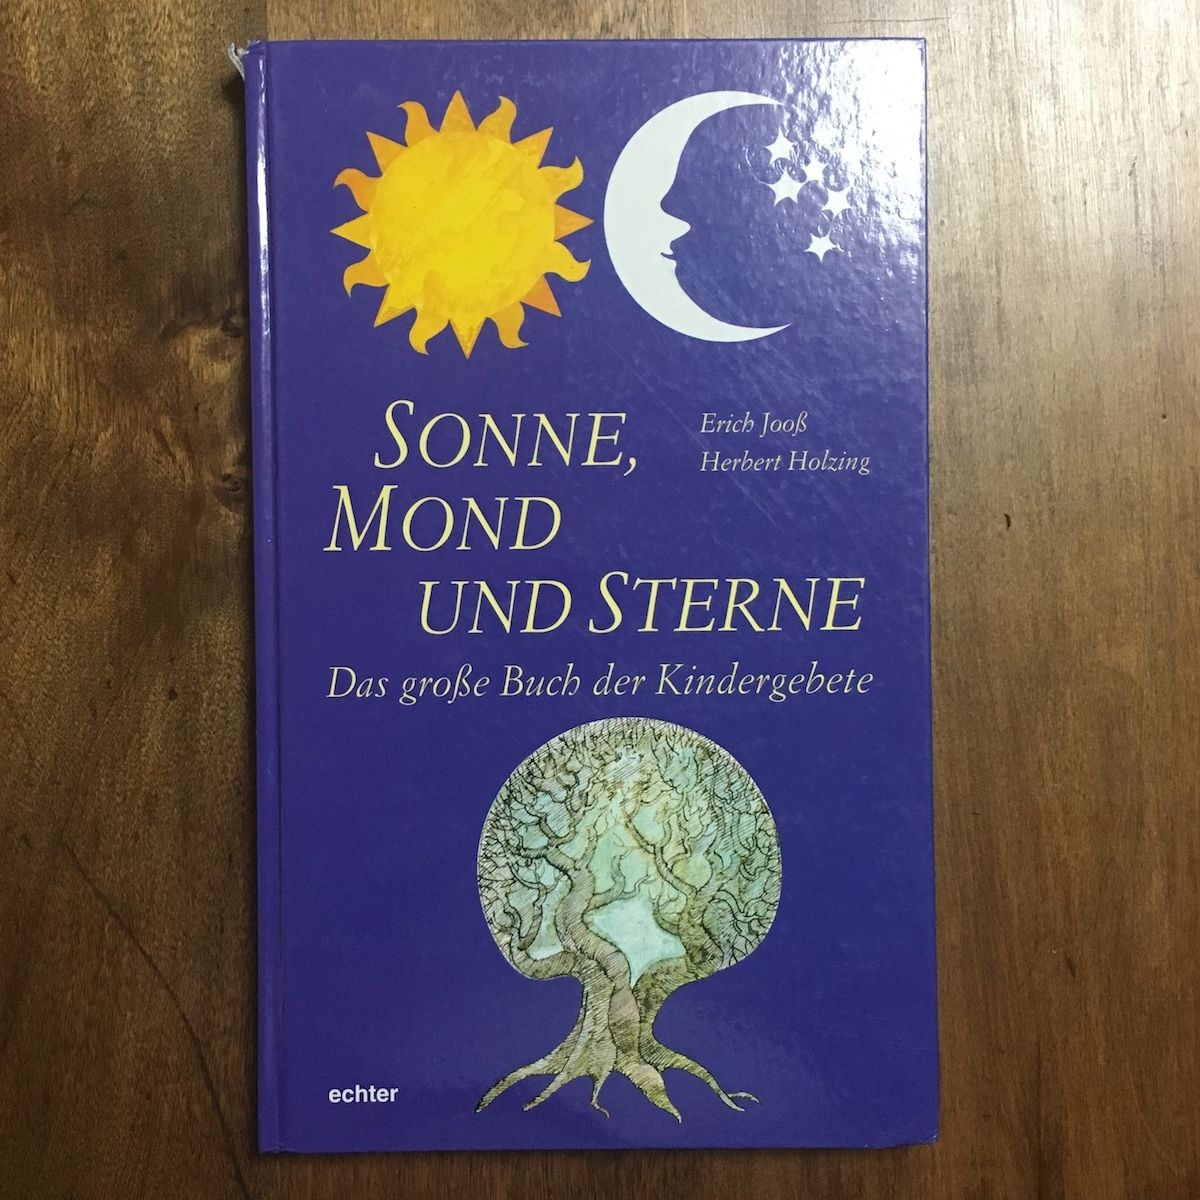 「SONNE, MOND UND STERNE」Erich Jooss Herbert Holzing(ヘルベルト・ホルツィング)